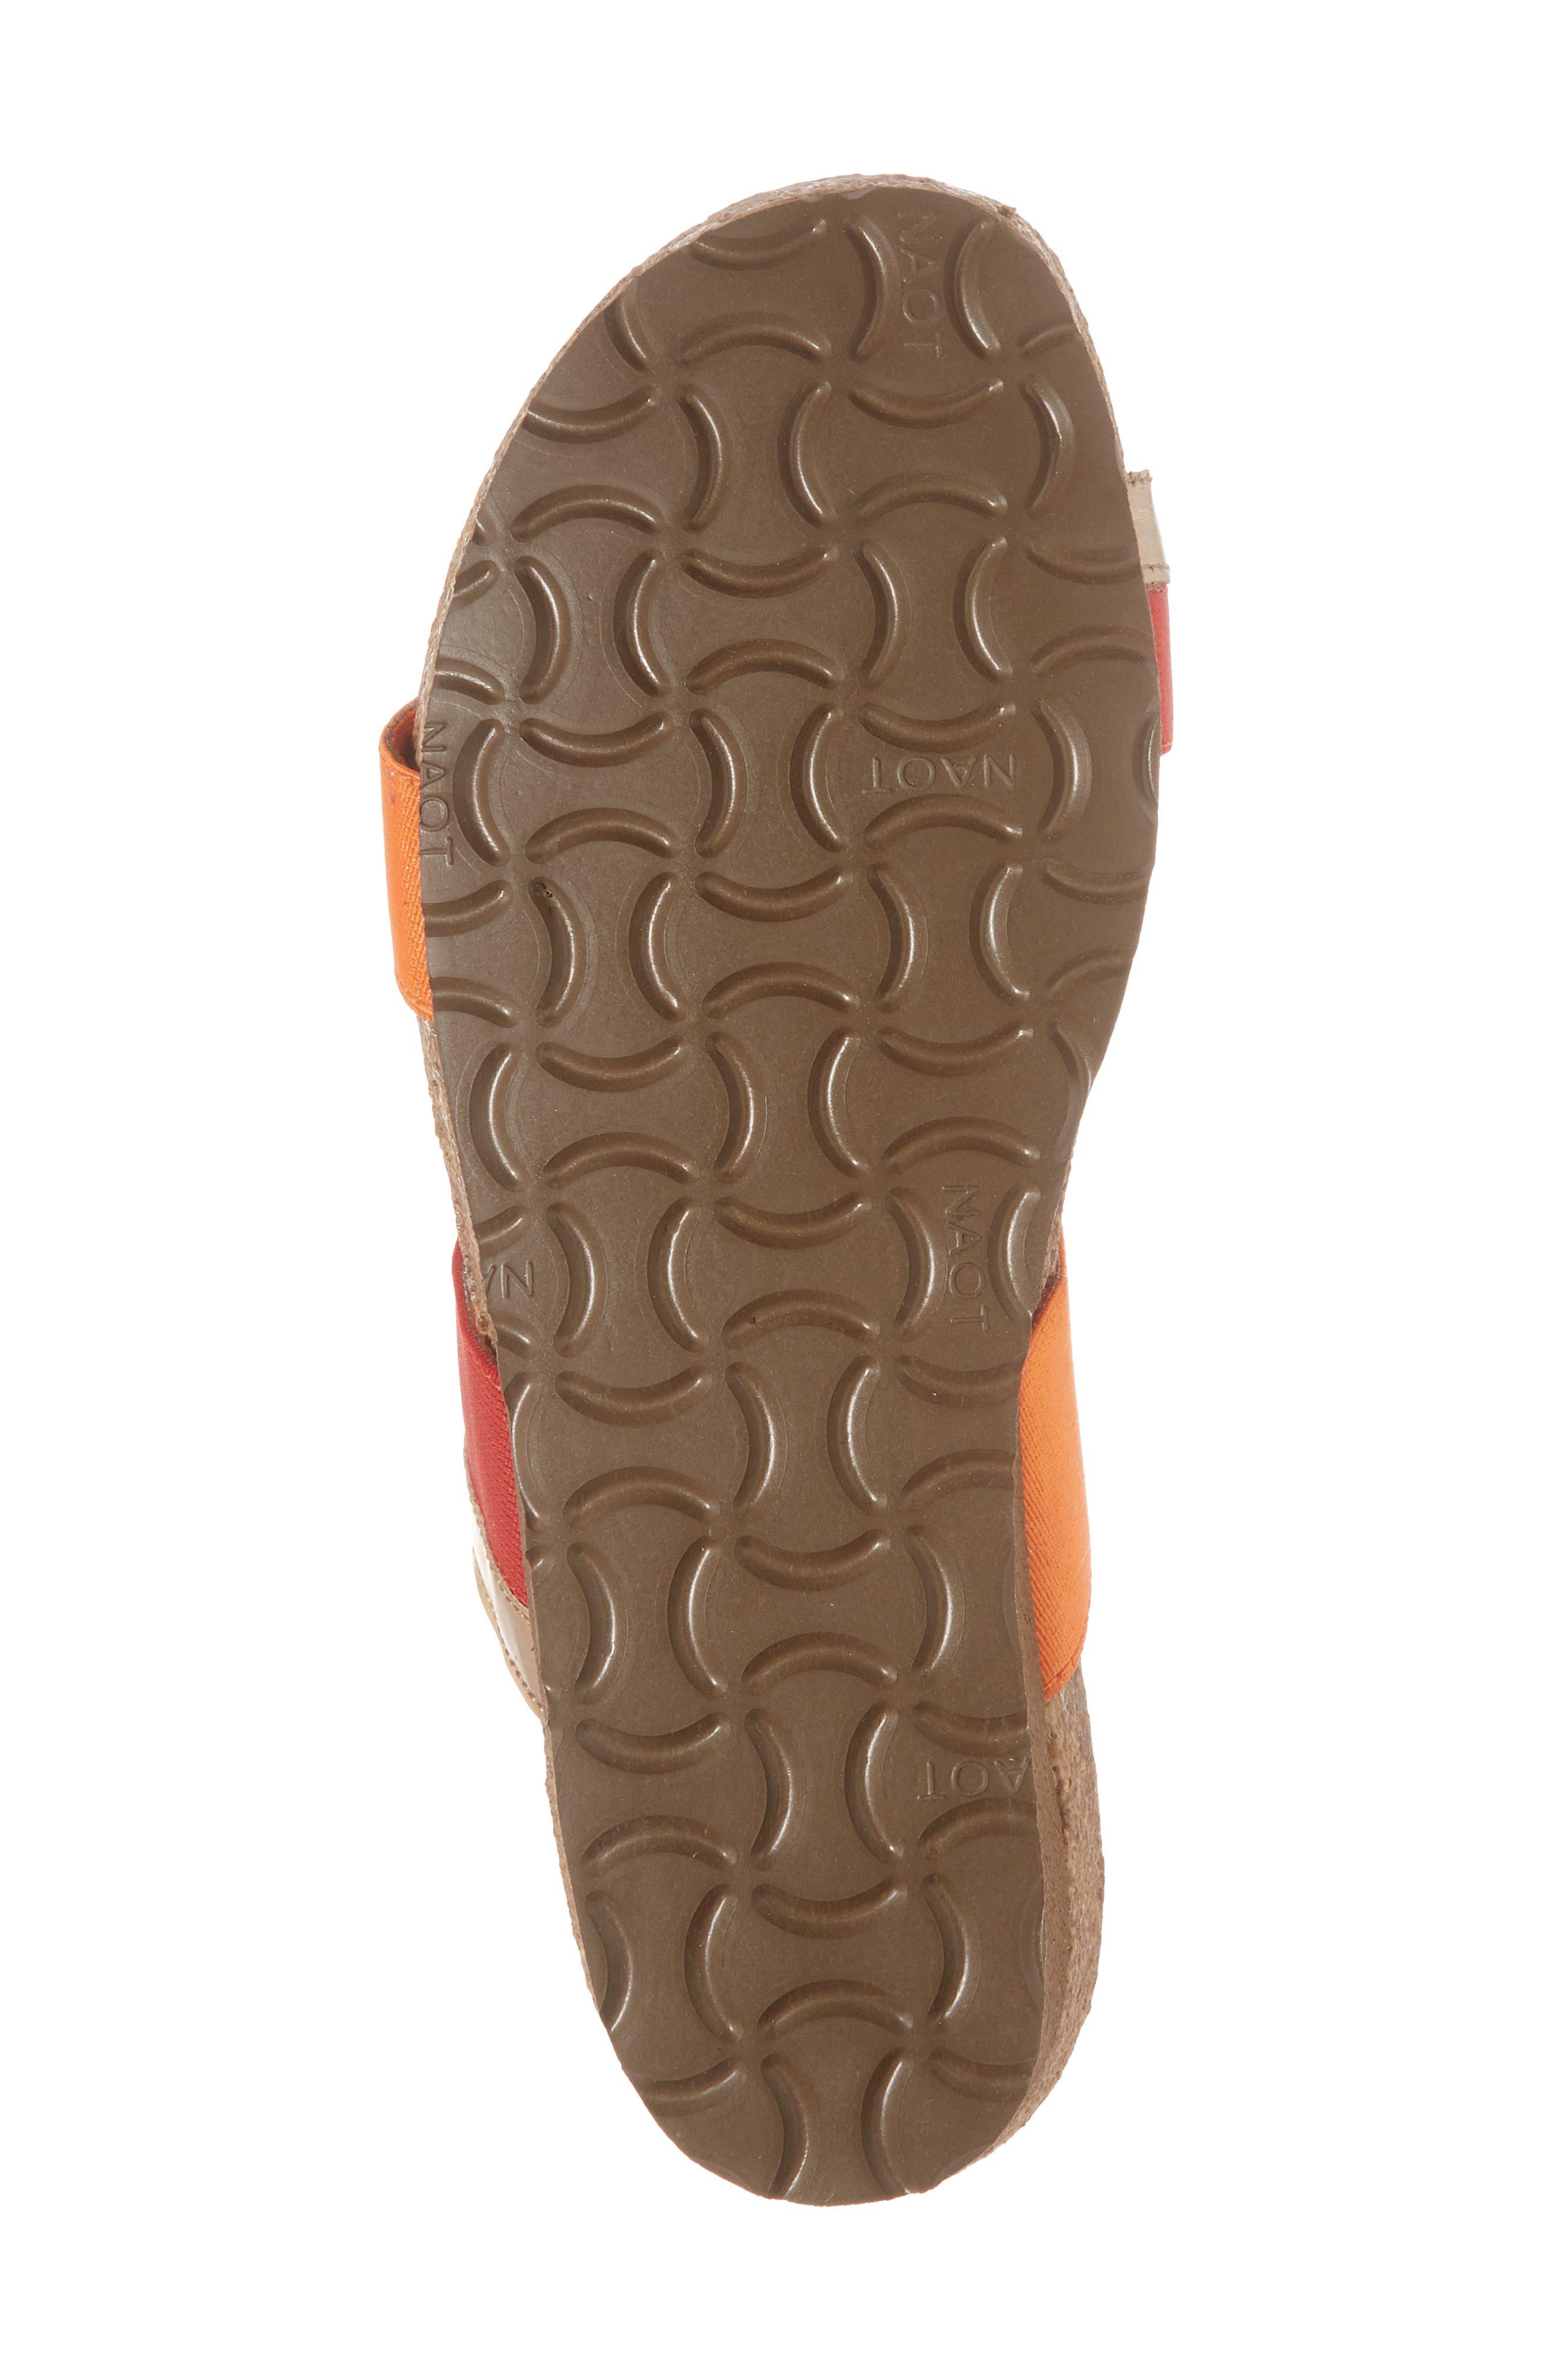 Frankie Slide Sandal,                             Alternate thumbnail 6, color,                             Red/ Orange/ Gold Leather